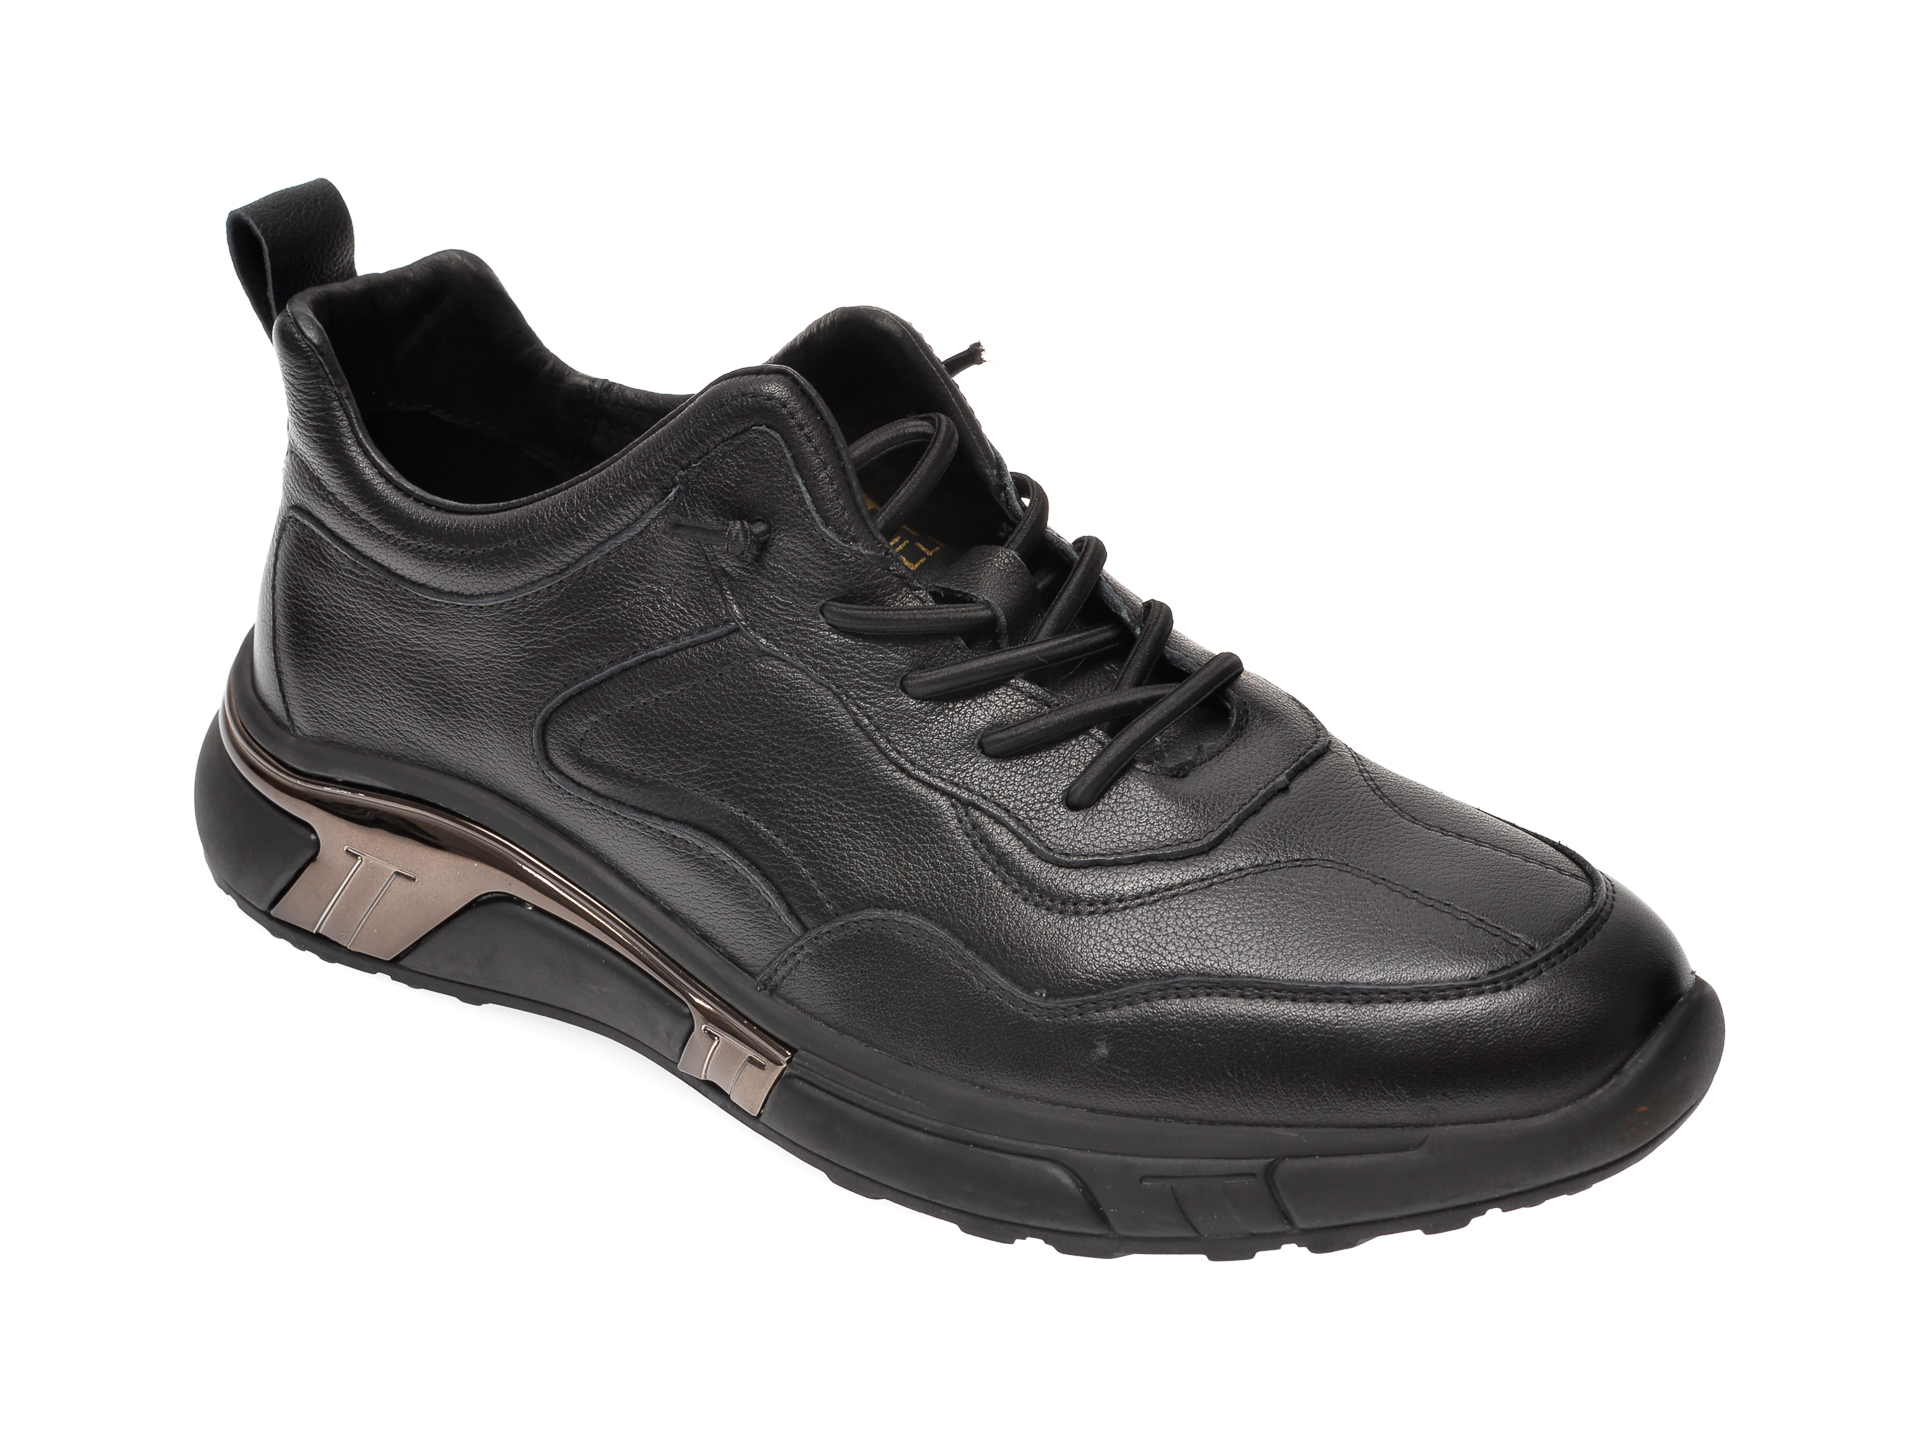 Pantofi sport BITE THE BULLET negri, 20327, din piele naturala imagine